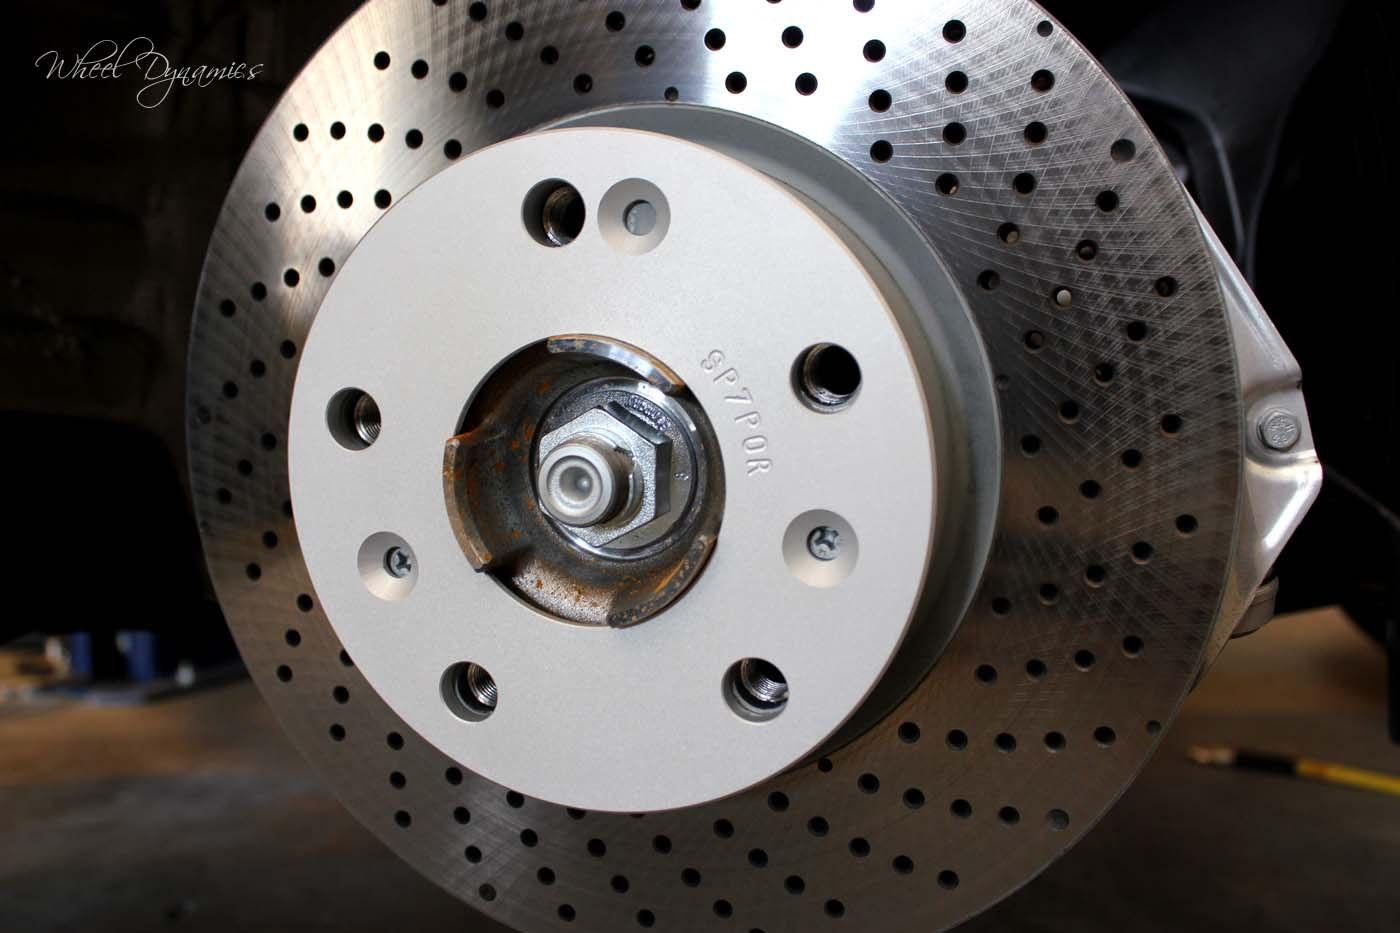 Porsche Gt3 Rs Replica Wheels Rims 18 Quot Now In Stock Photos